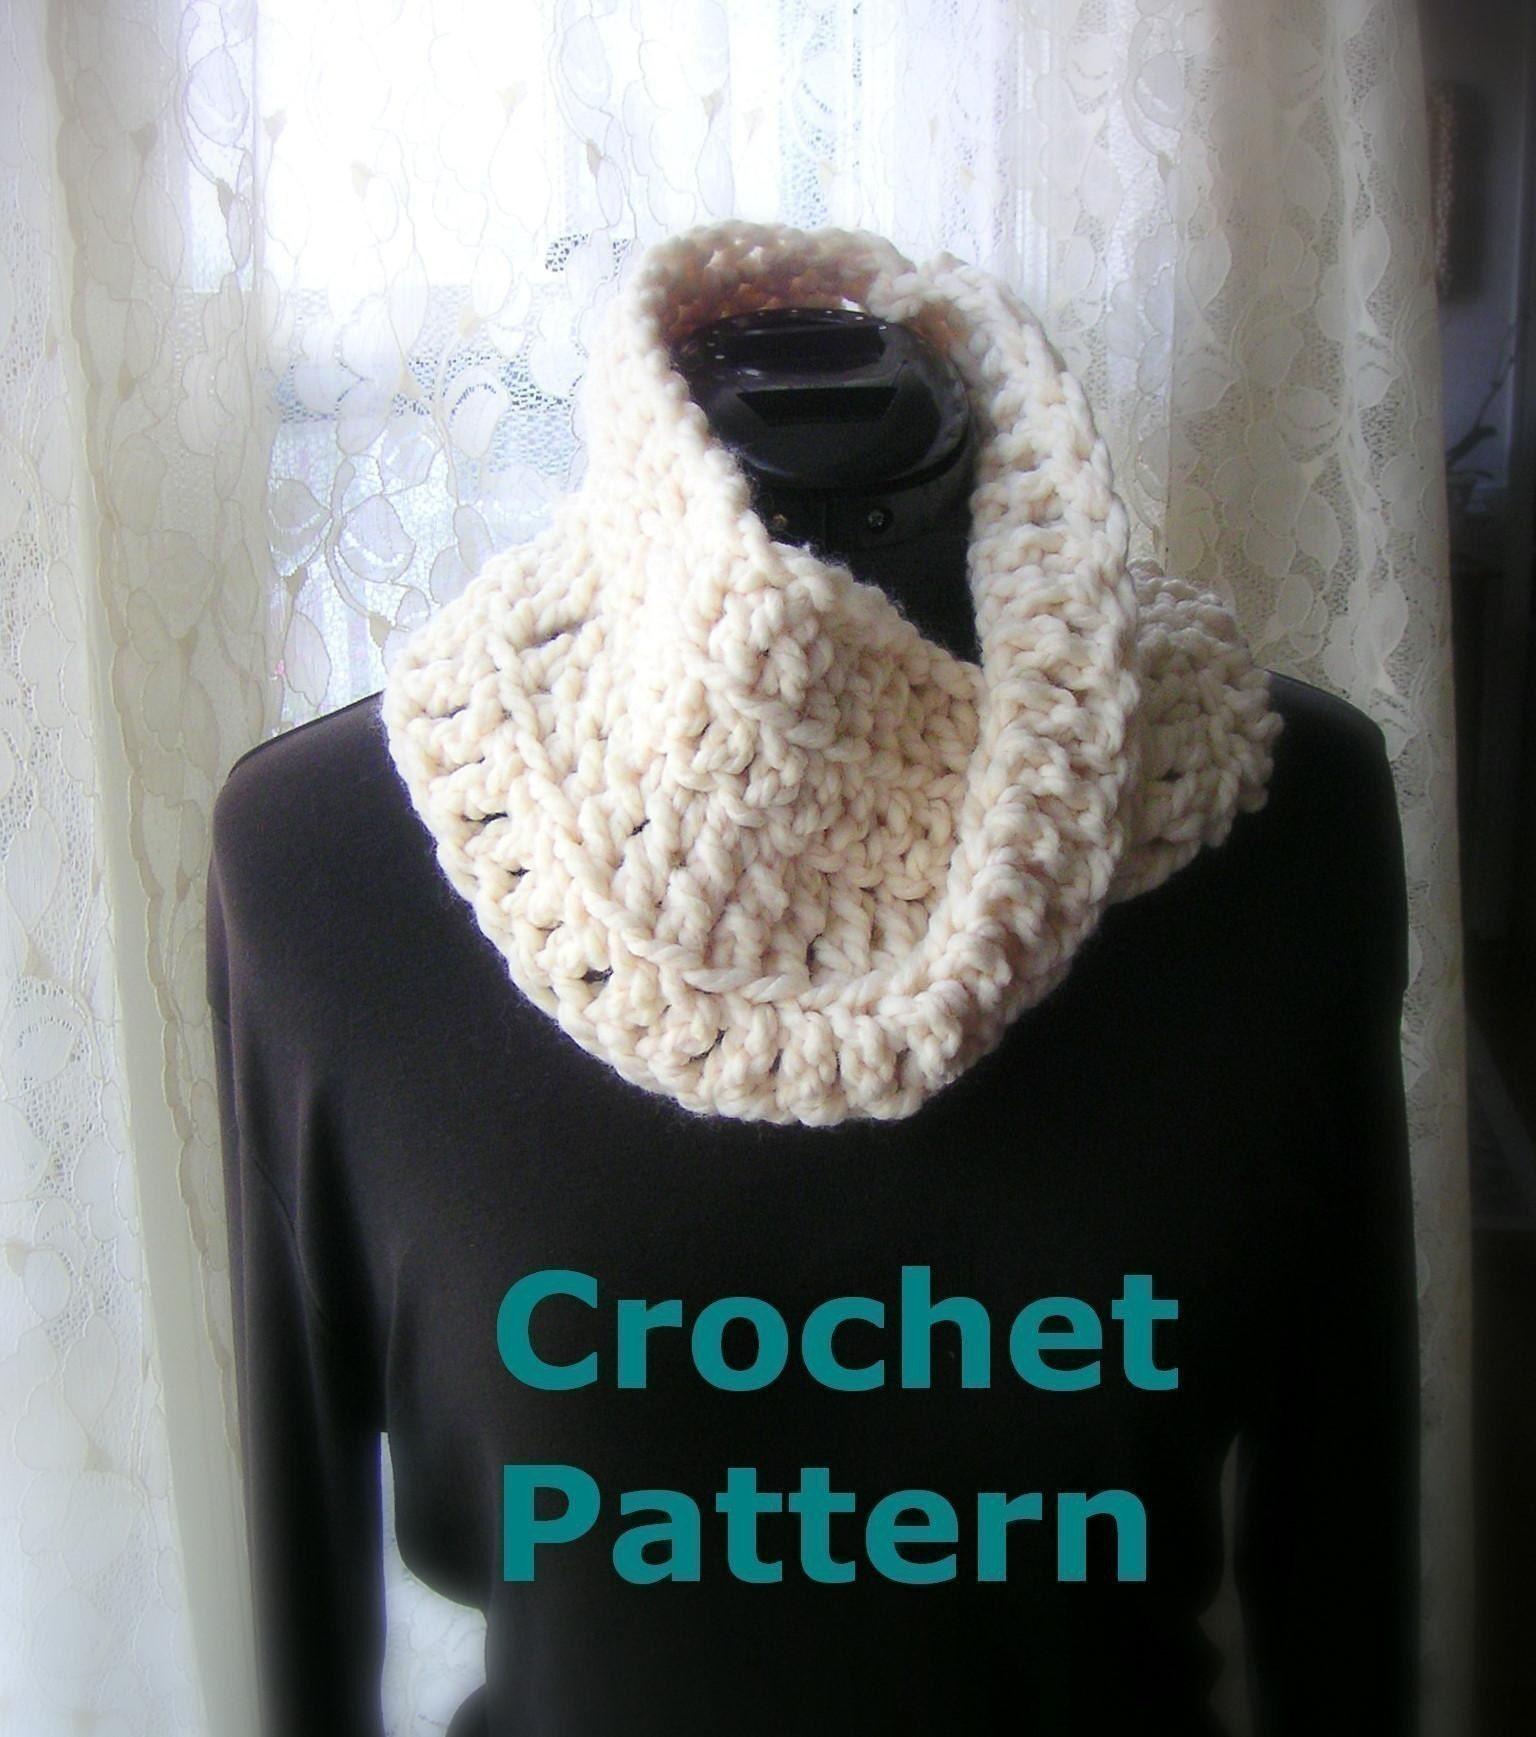 Crochet Infinity Scarf Tutorial For Beginners : Easy Crochet Pattern pdf Infinity Scarf by ...